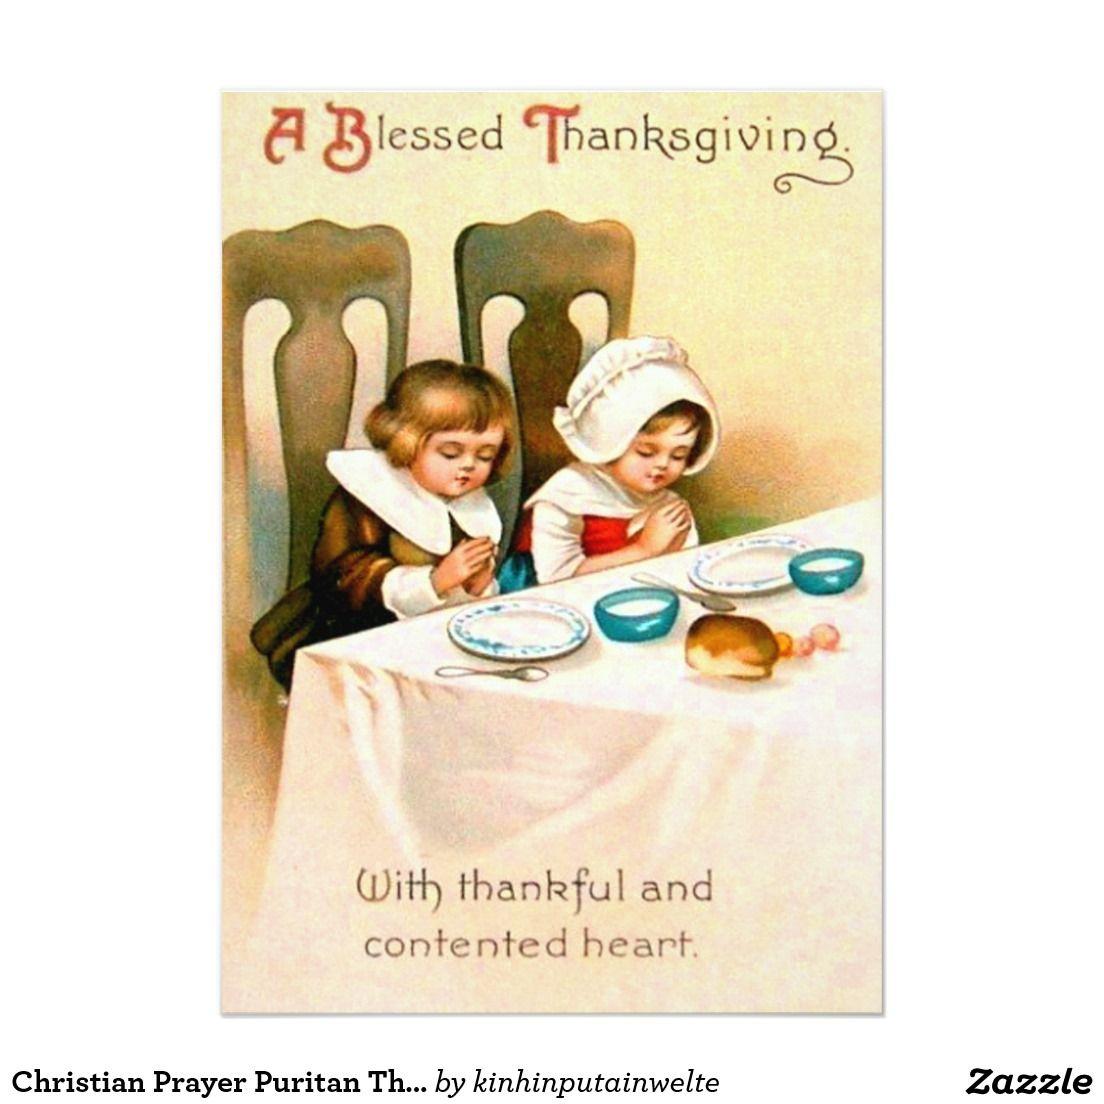 Christian prayer puritan thanksgiving dinner 5x7 paper invitation christian prayer puritan thanksgiving dinner 5x7 paper invitation card kristyandbryce Choice Image